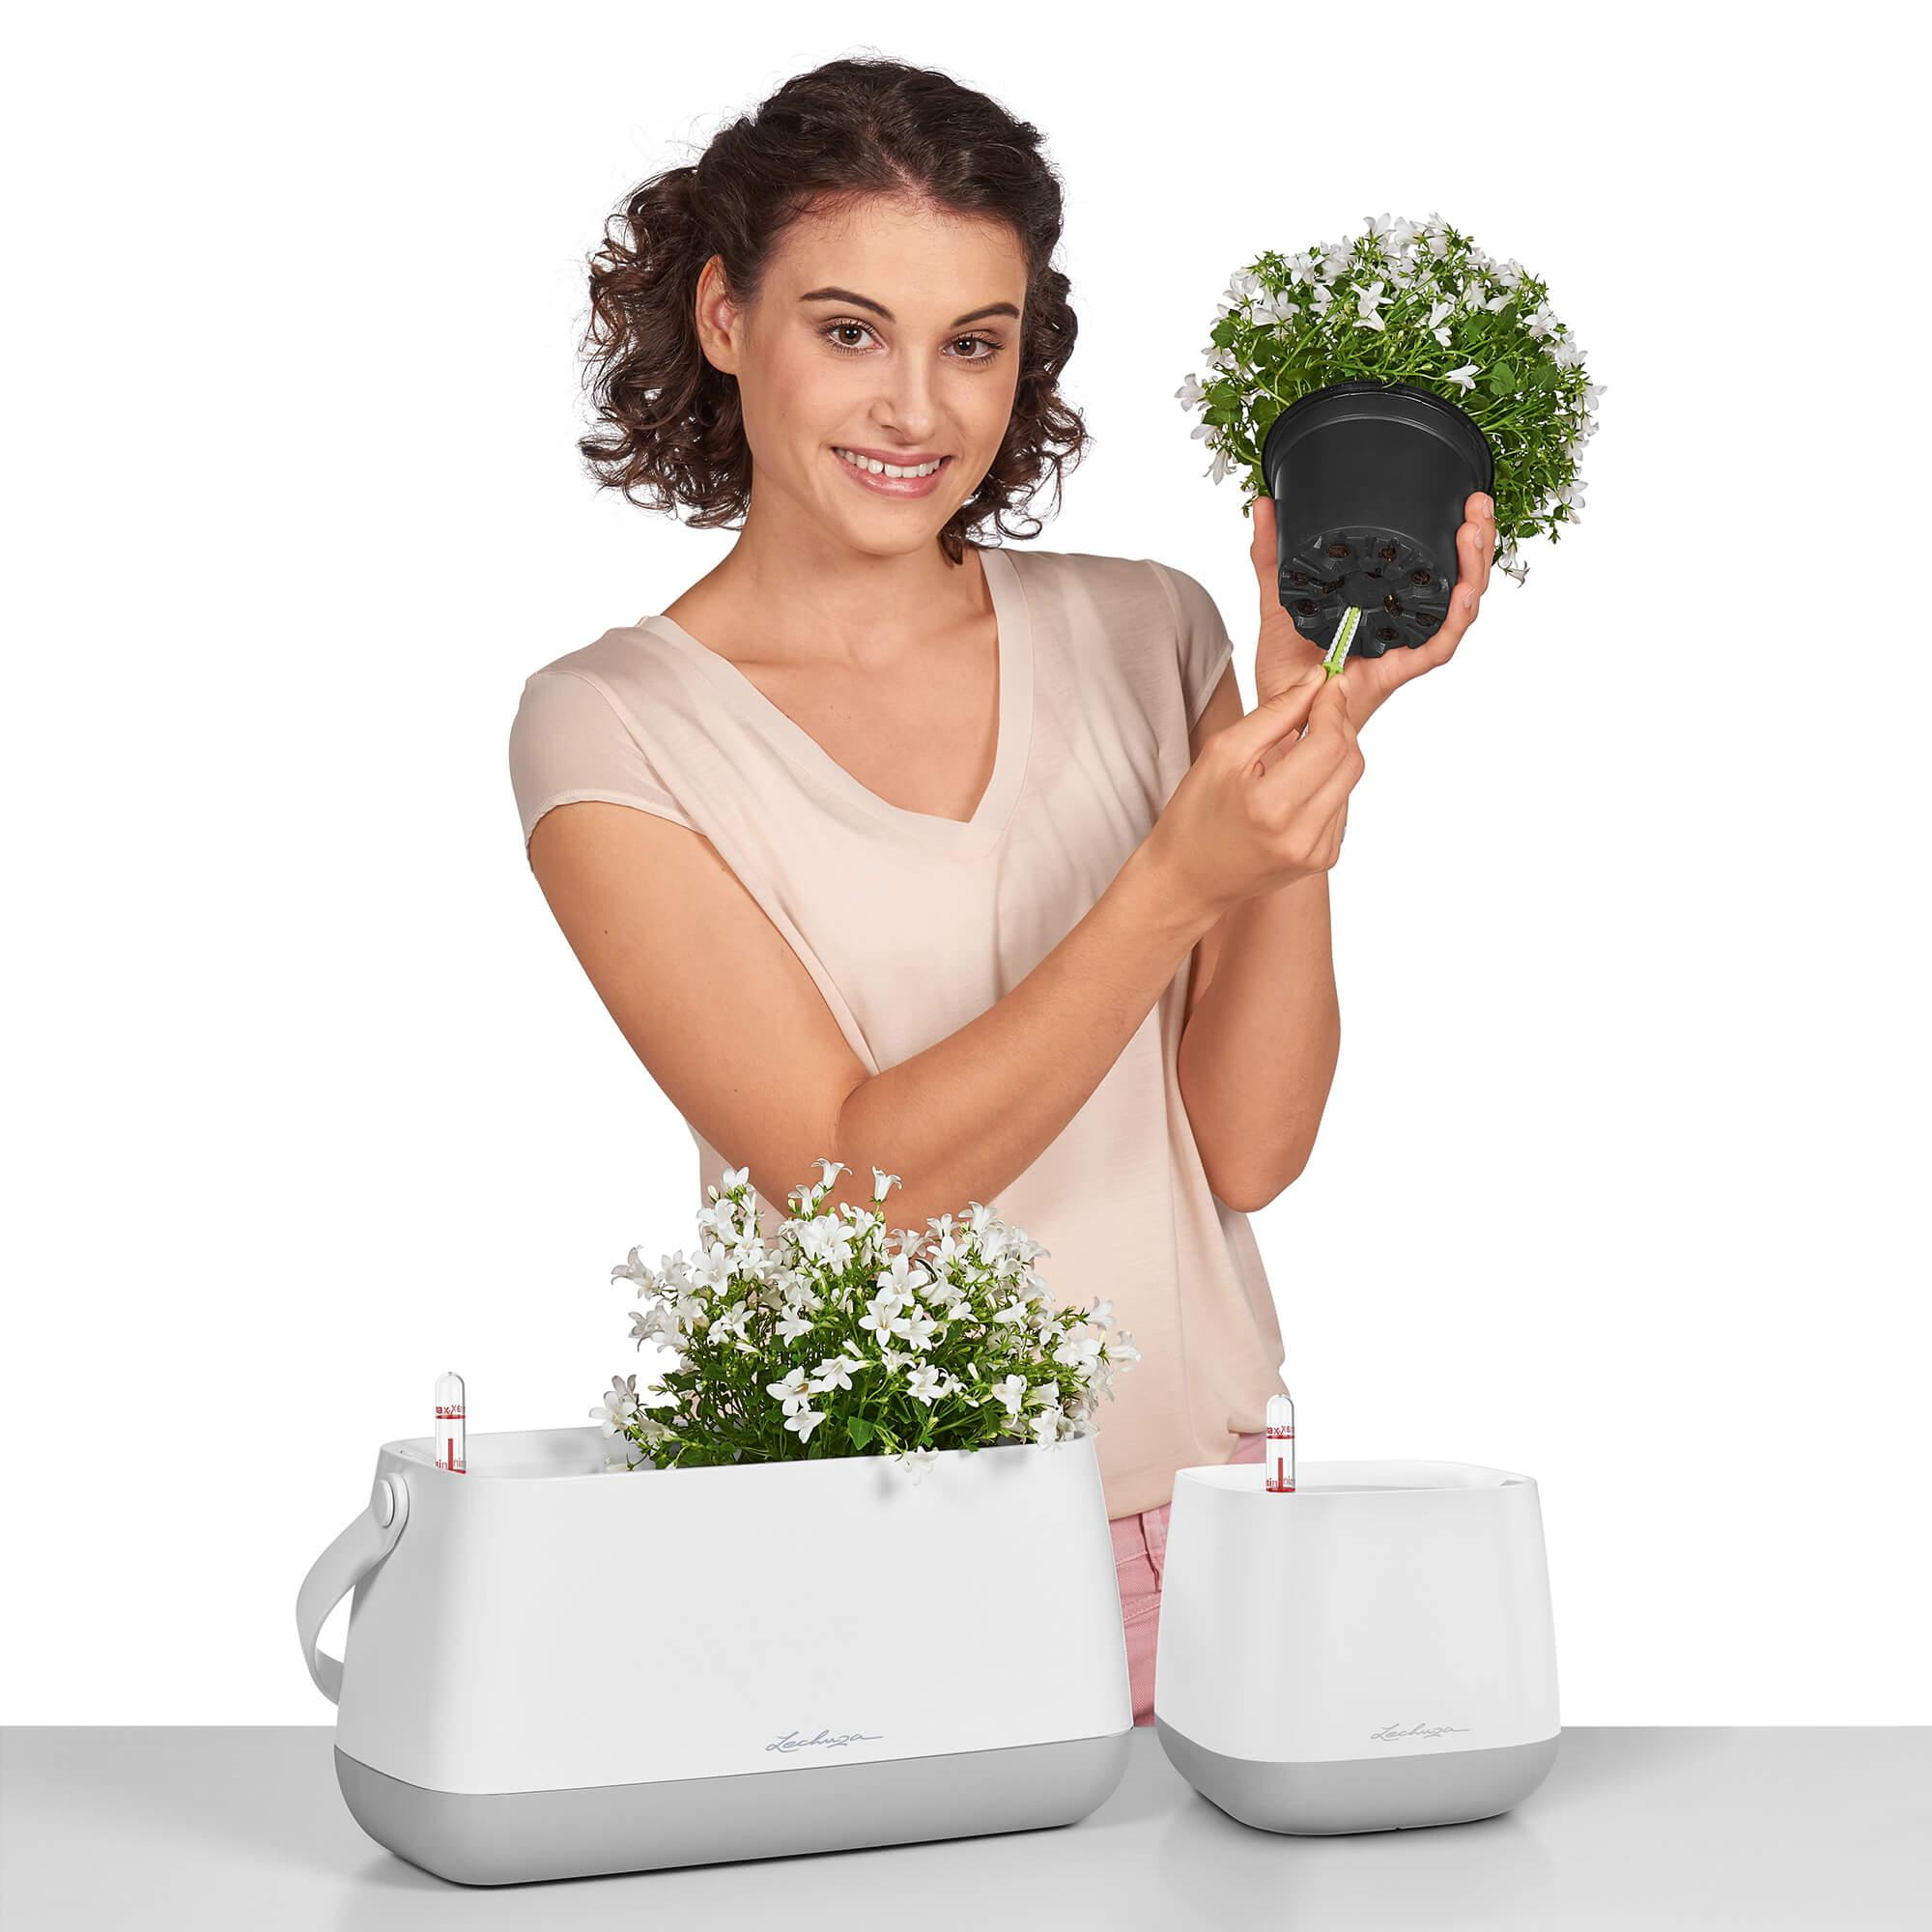 YULA planter white/pistachio semi-gloss - Image 4